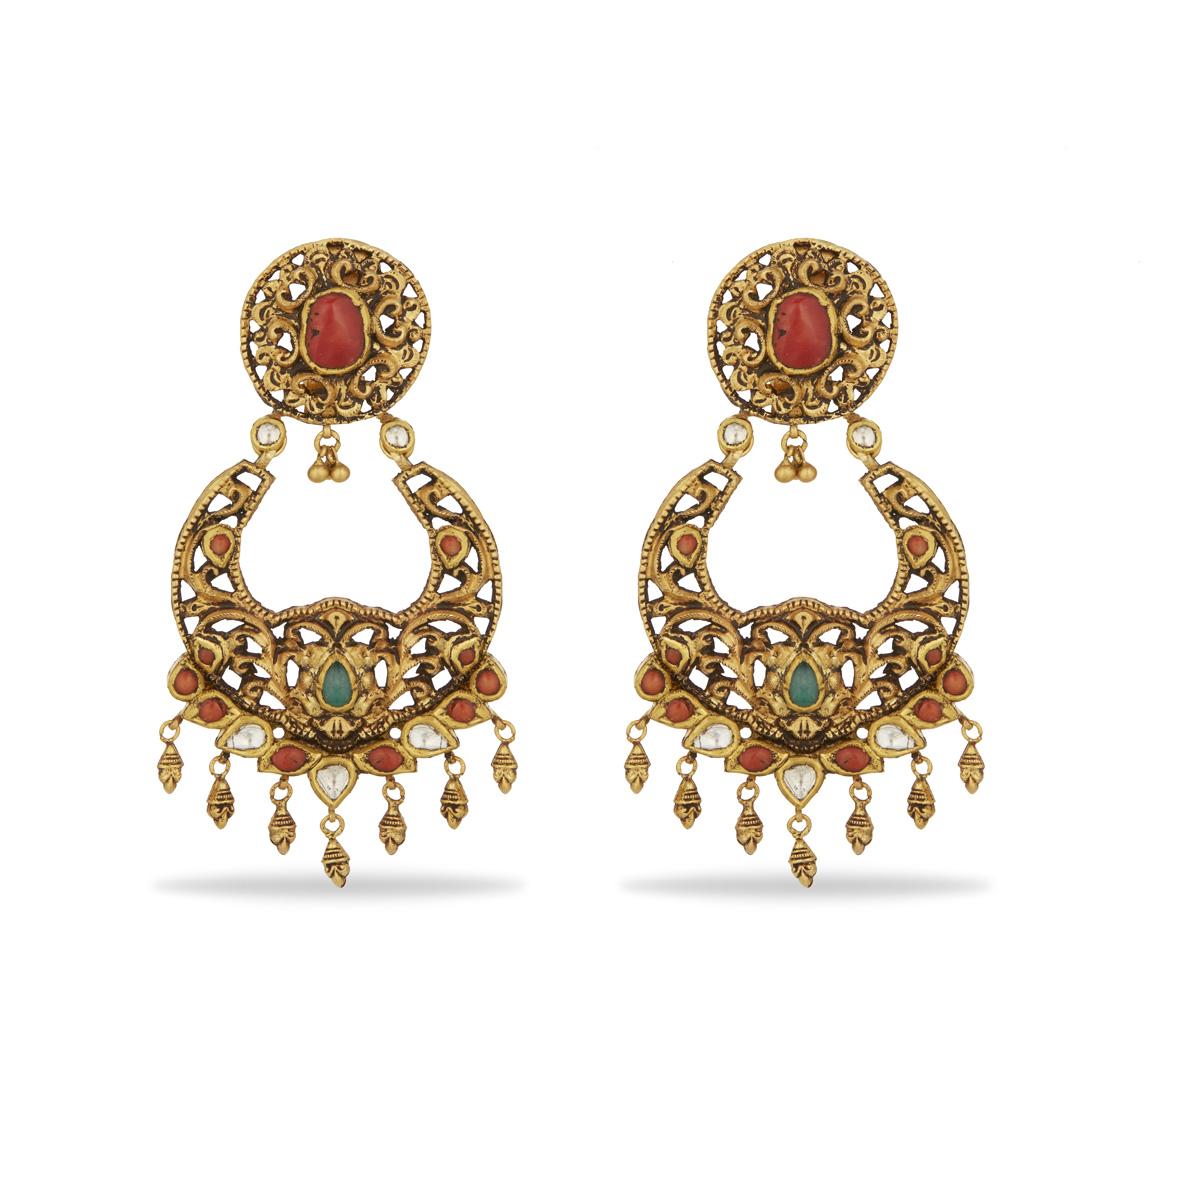 Nayaab Chand Bali Earrings